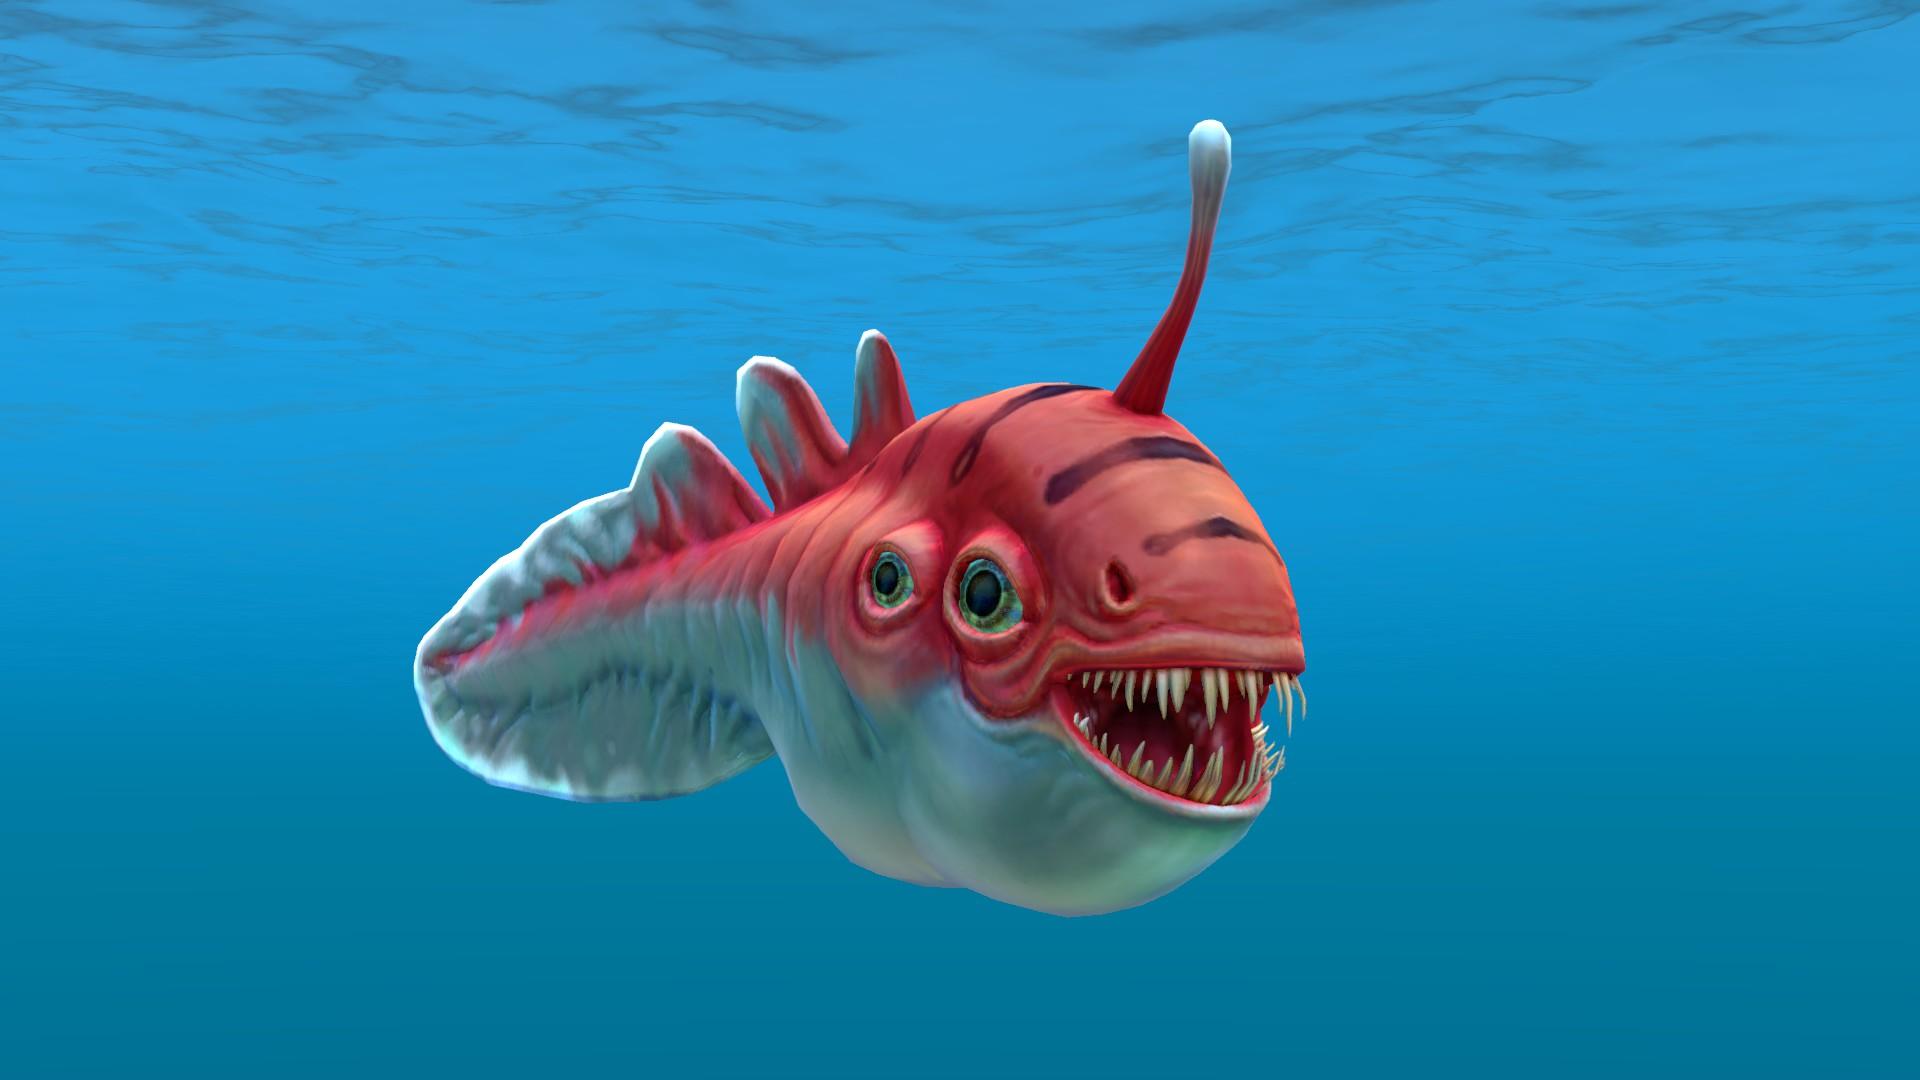 Файл:Biter Fish (1).jpg